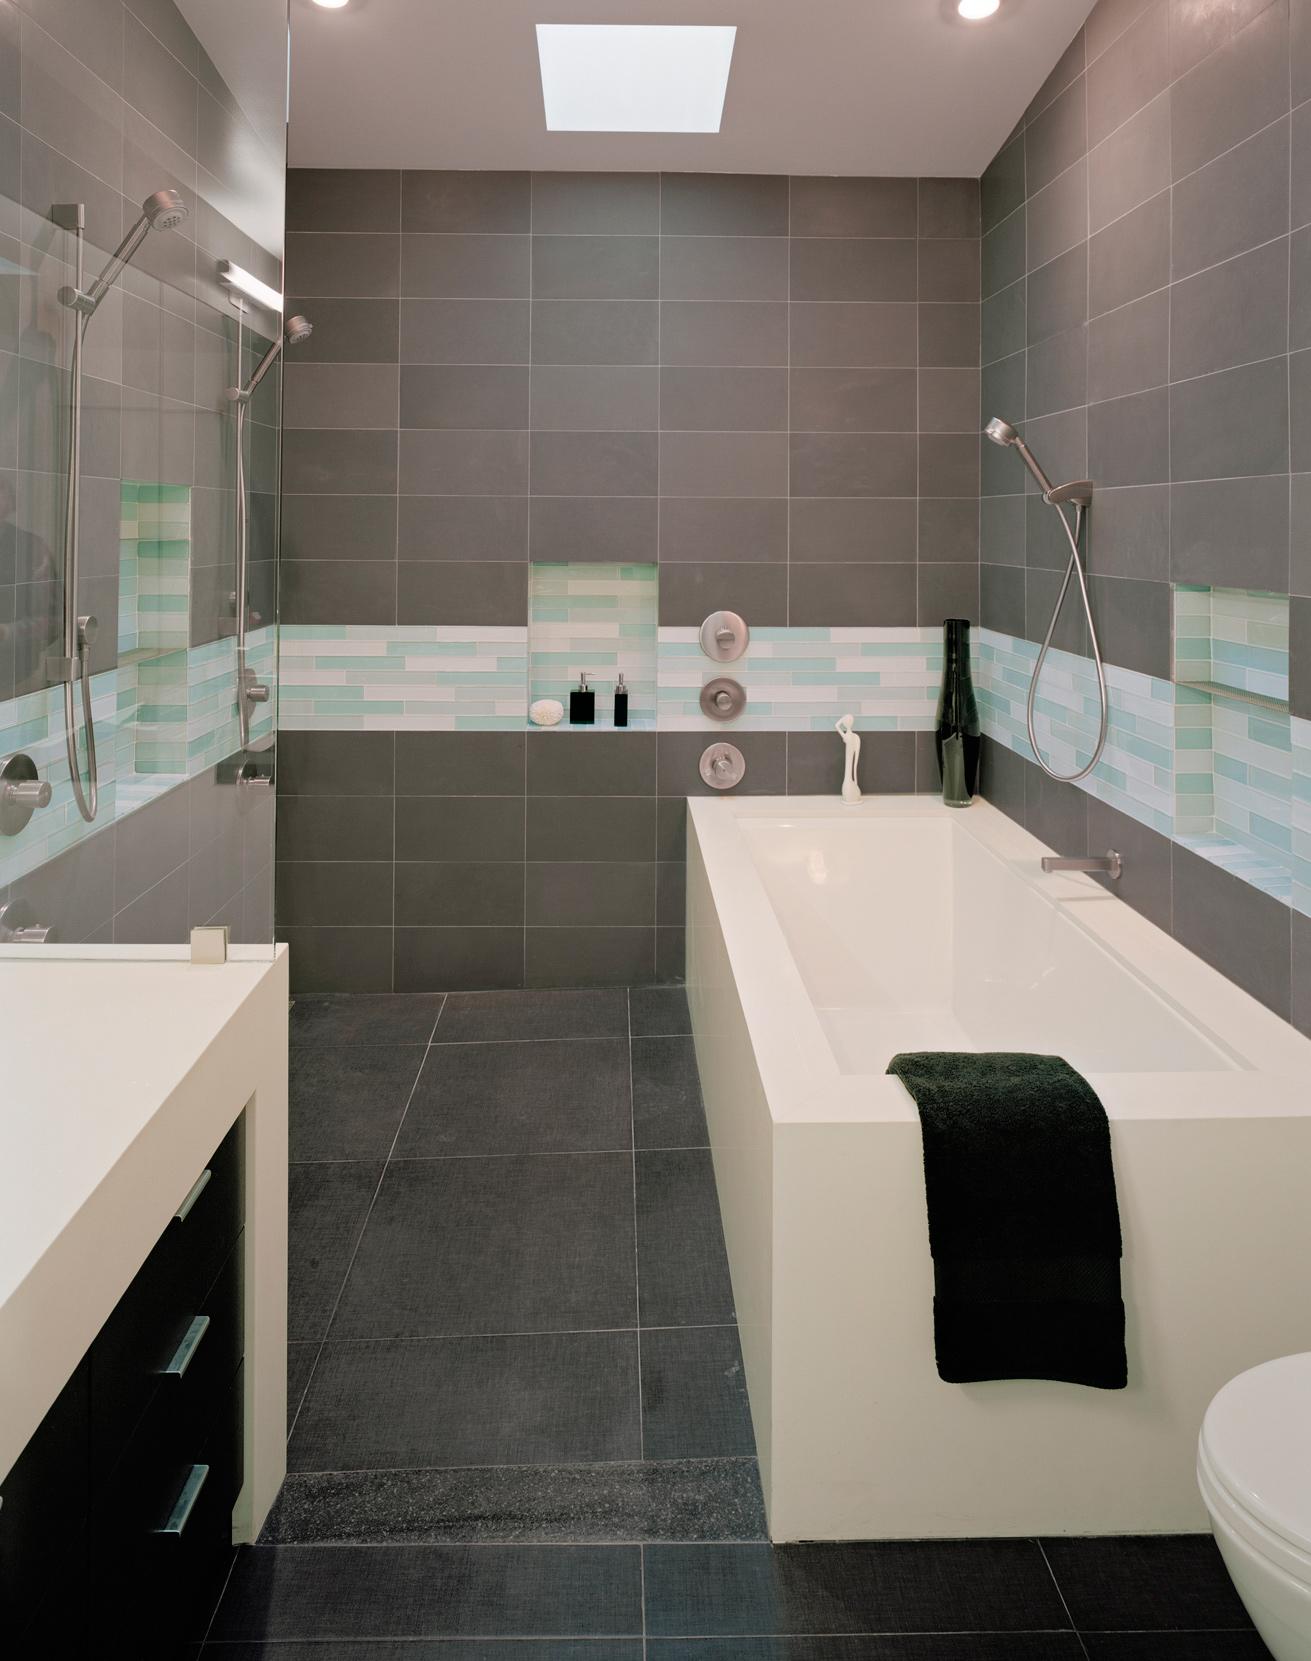 Mater-bath-with-walk-in-shower.jpg